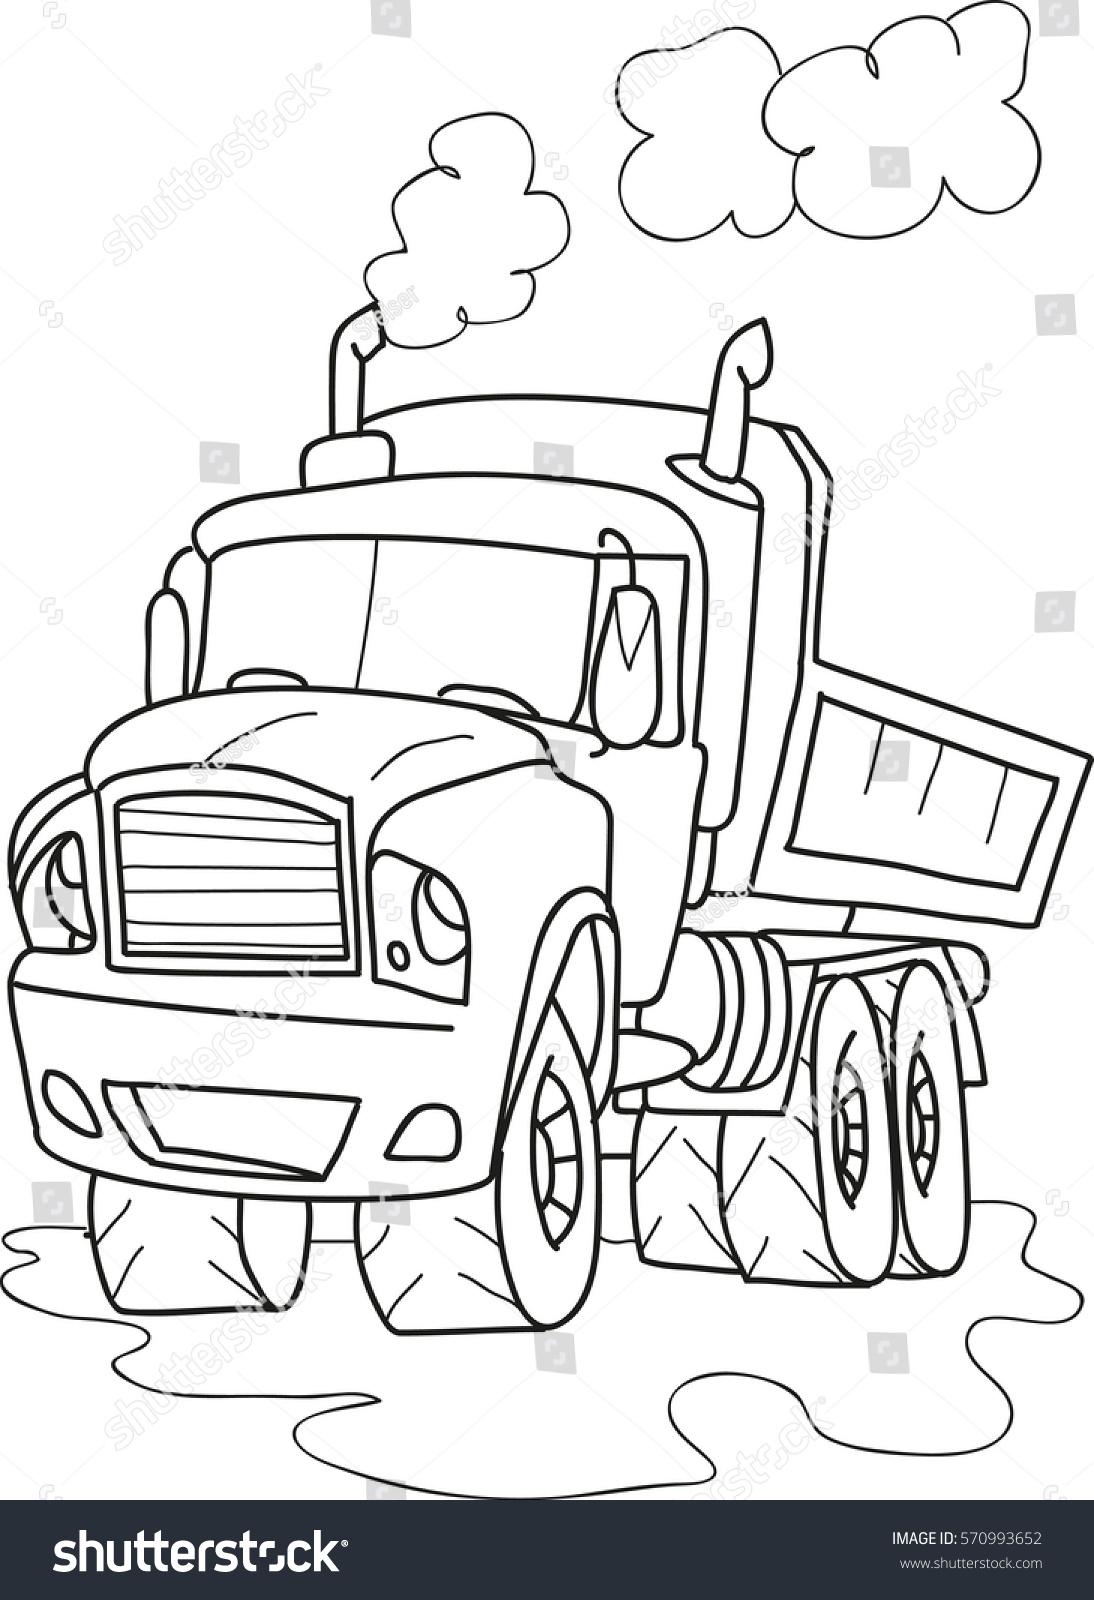 cartoon contour illustration of a big truck coloring book - Truck Coloring Book